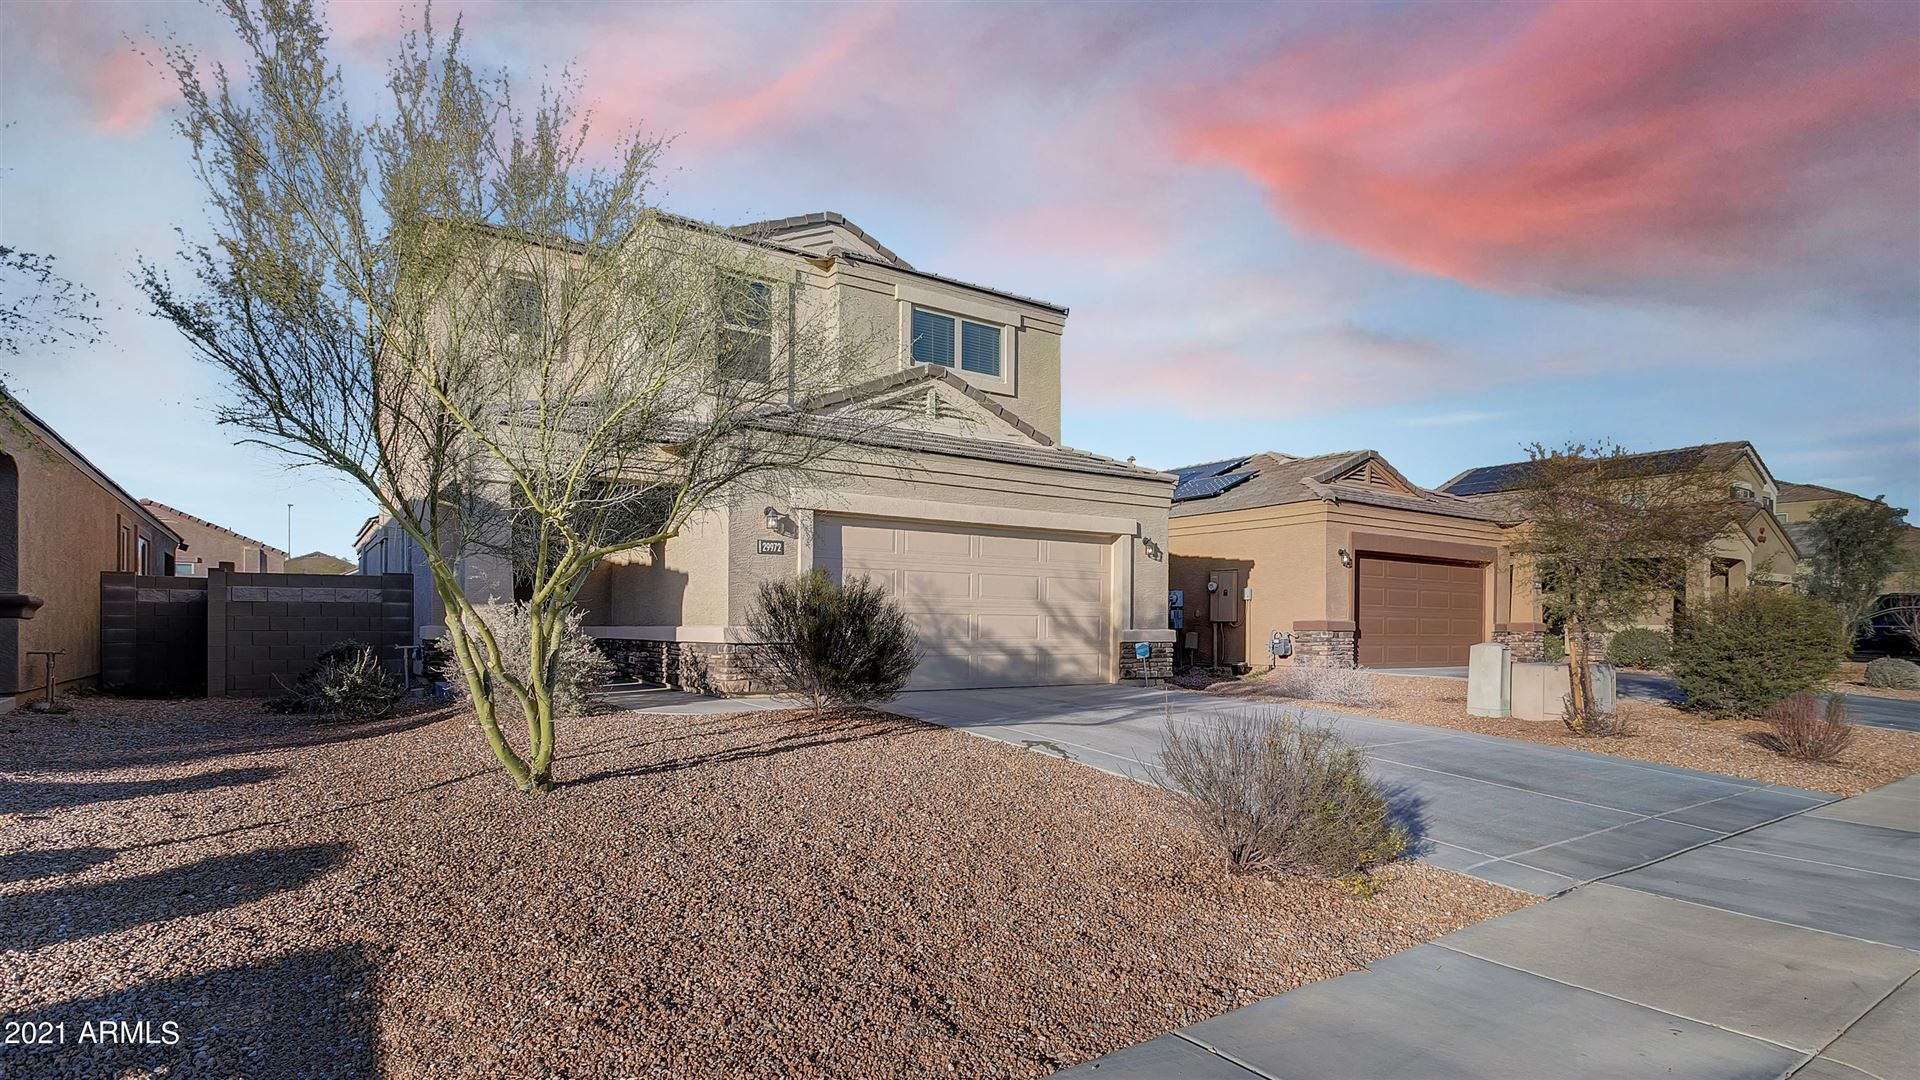 Photo of 29972 W MONTEREY Drive, Buckeye, AZ 85396 (MLS # 6195590)